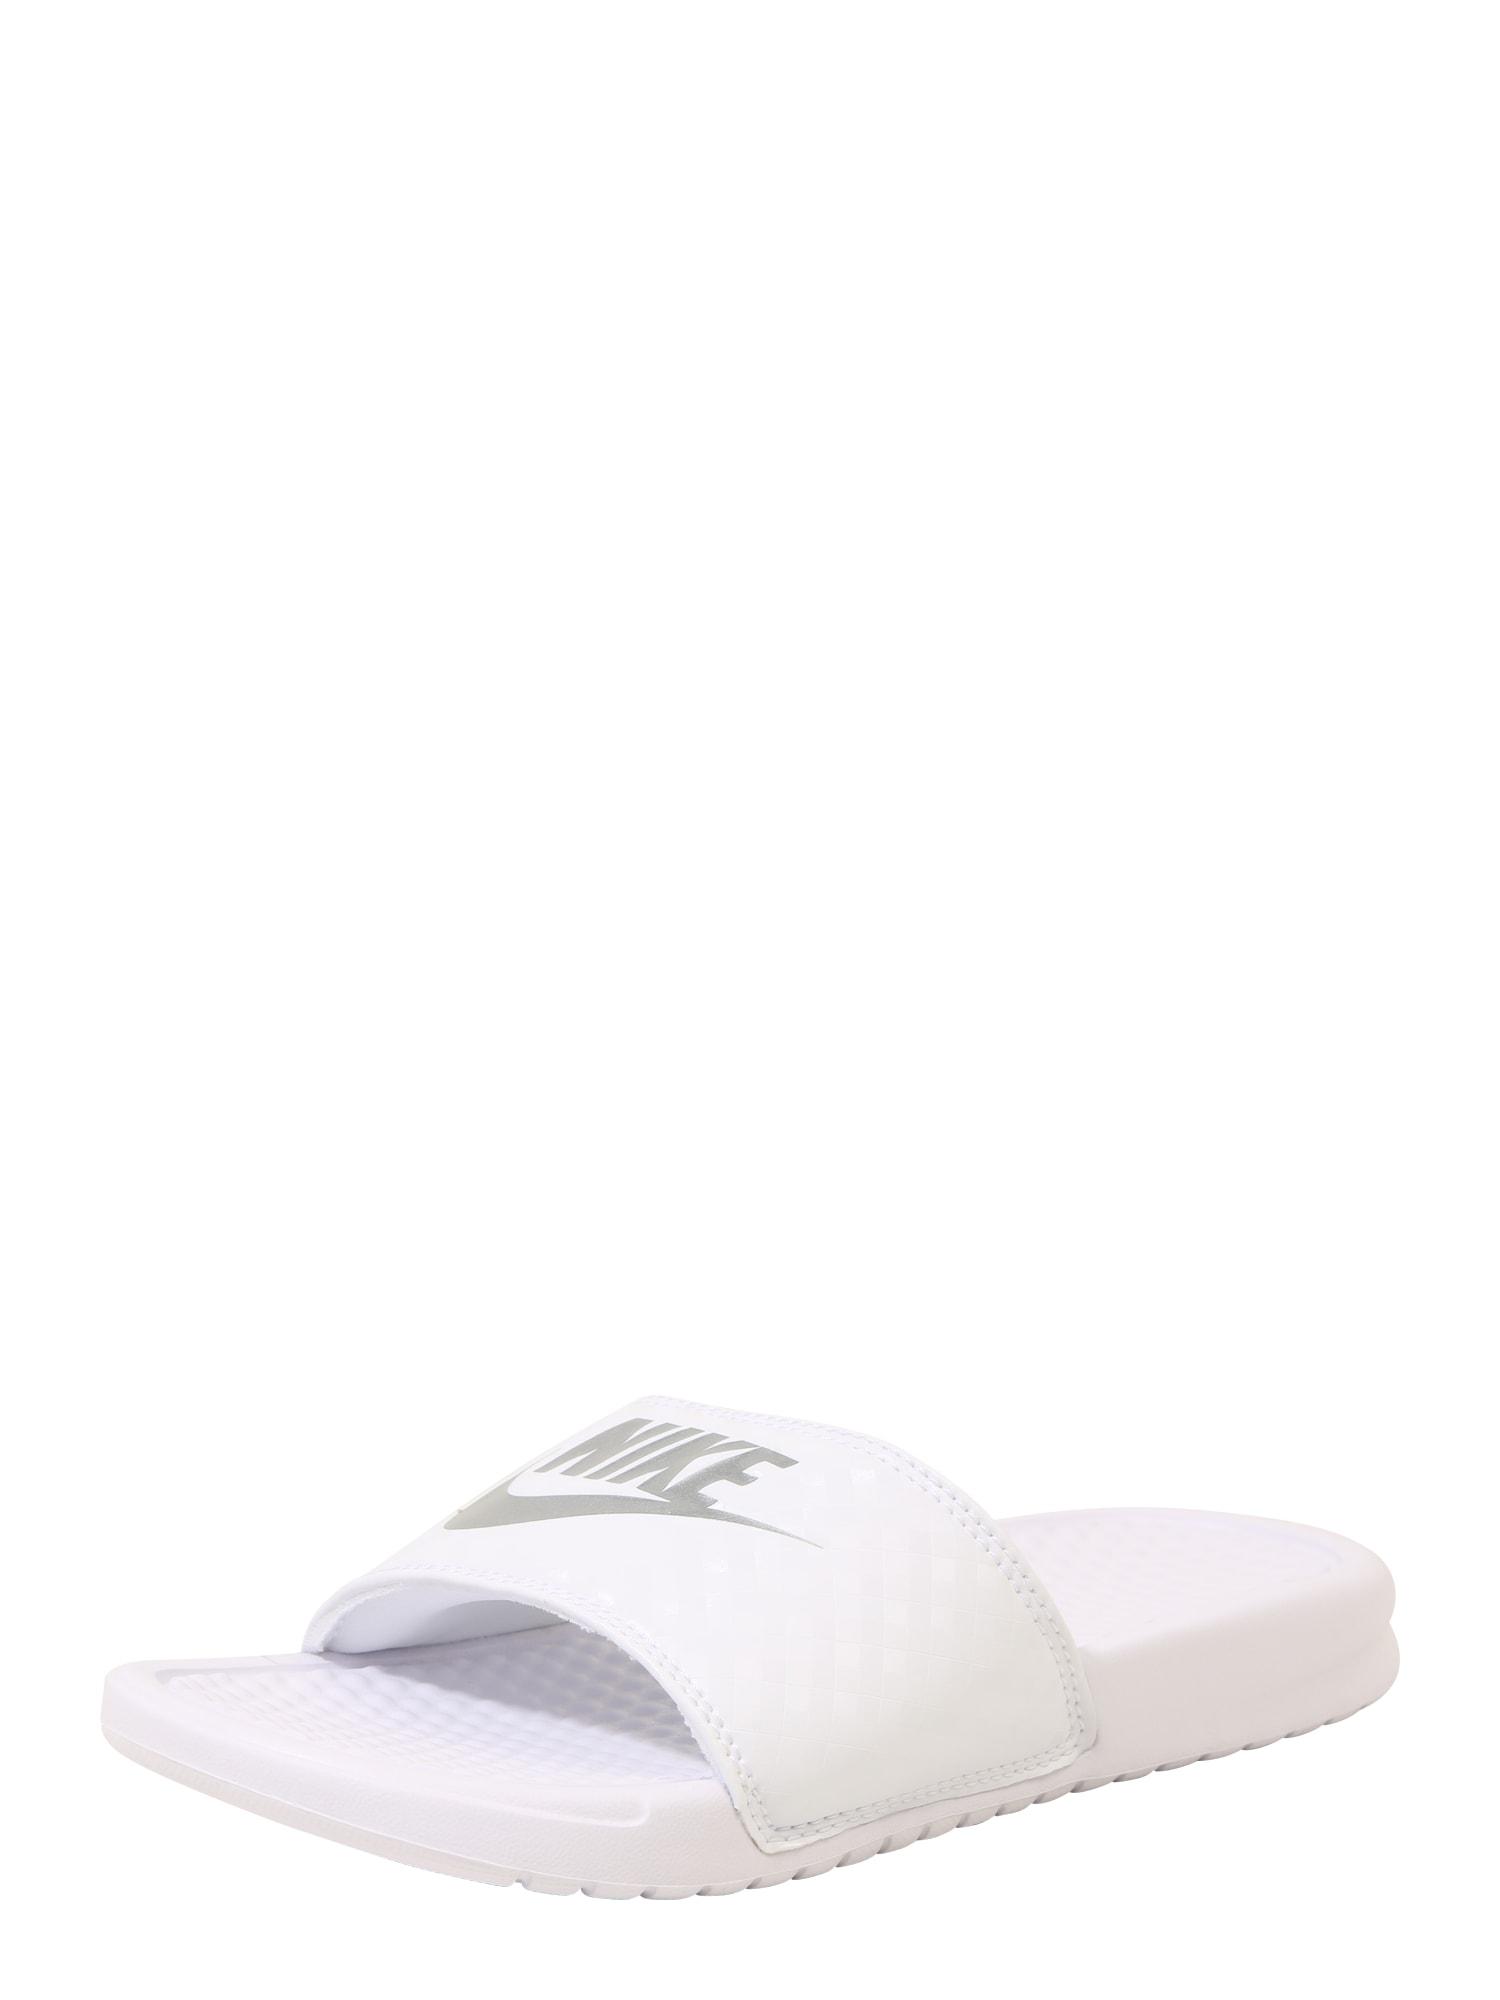 Nike Sportswear Pantofle 'Benassi Just Do It'  bílá